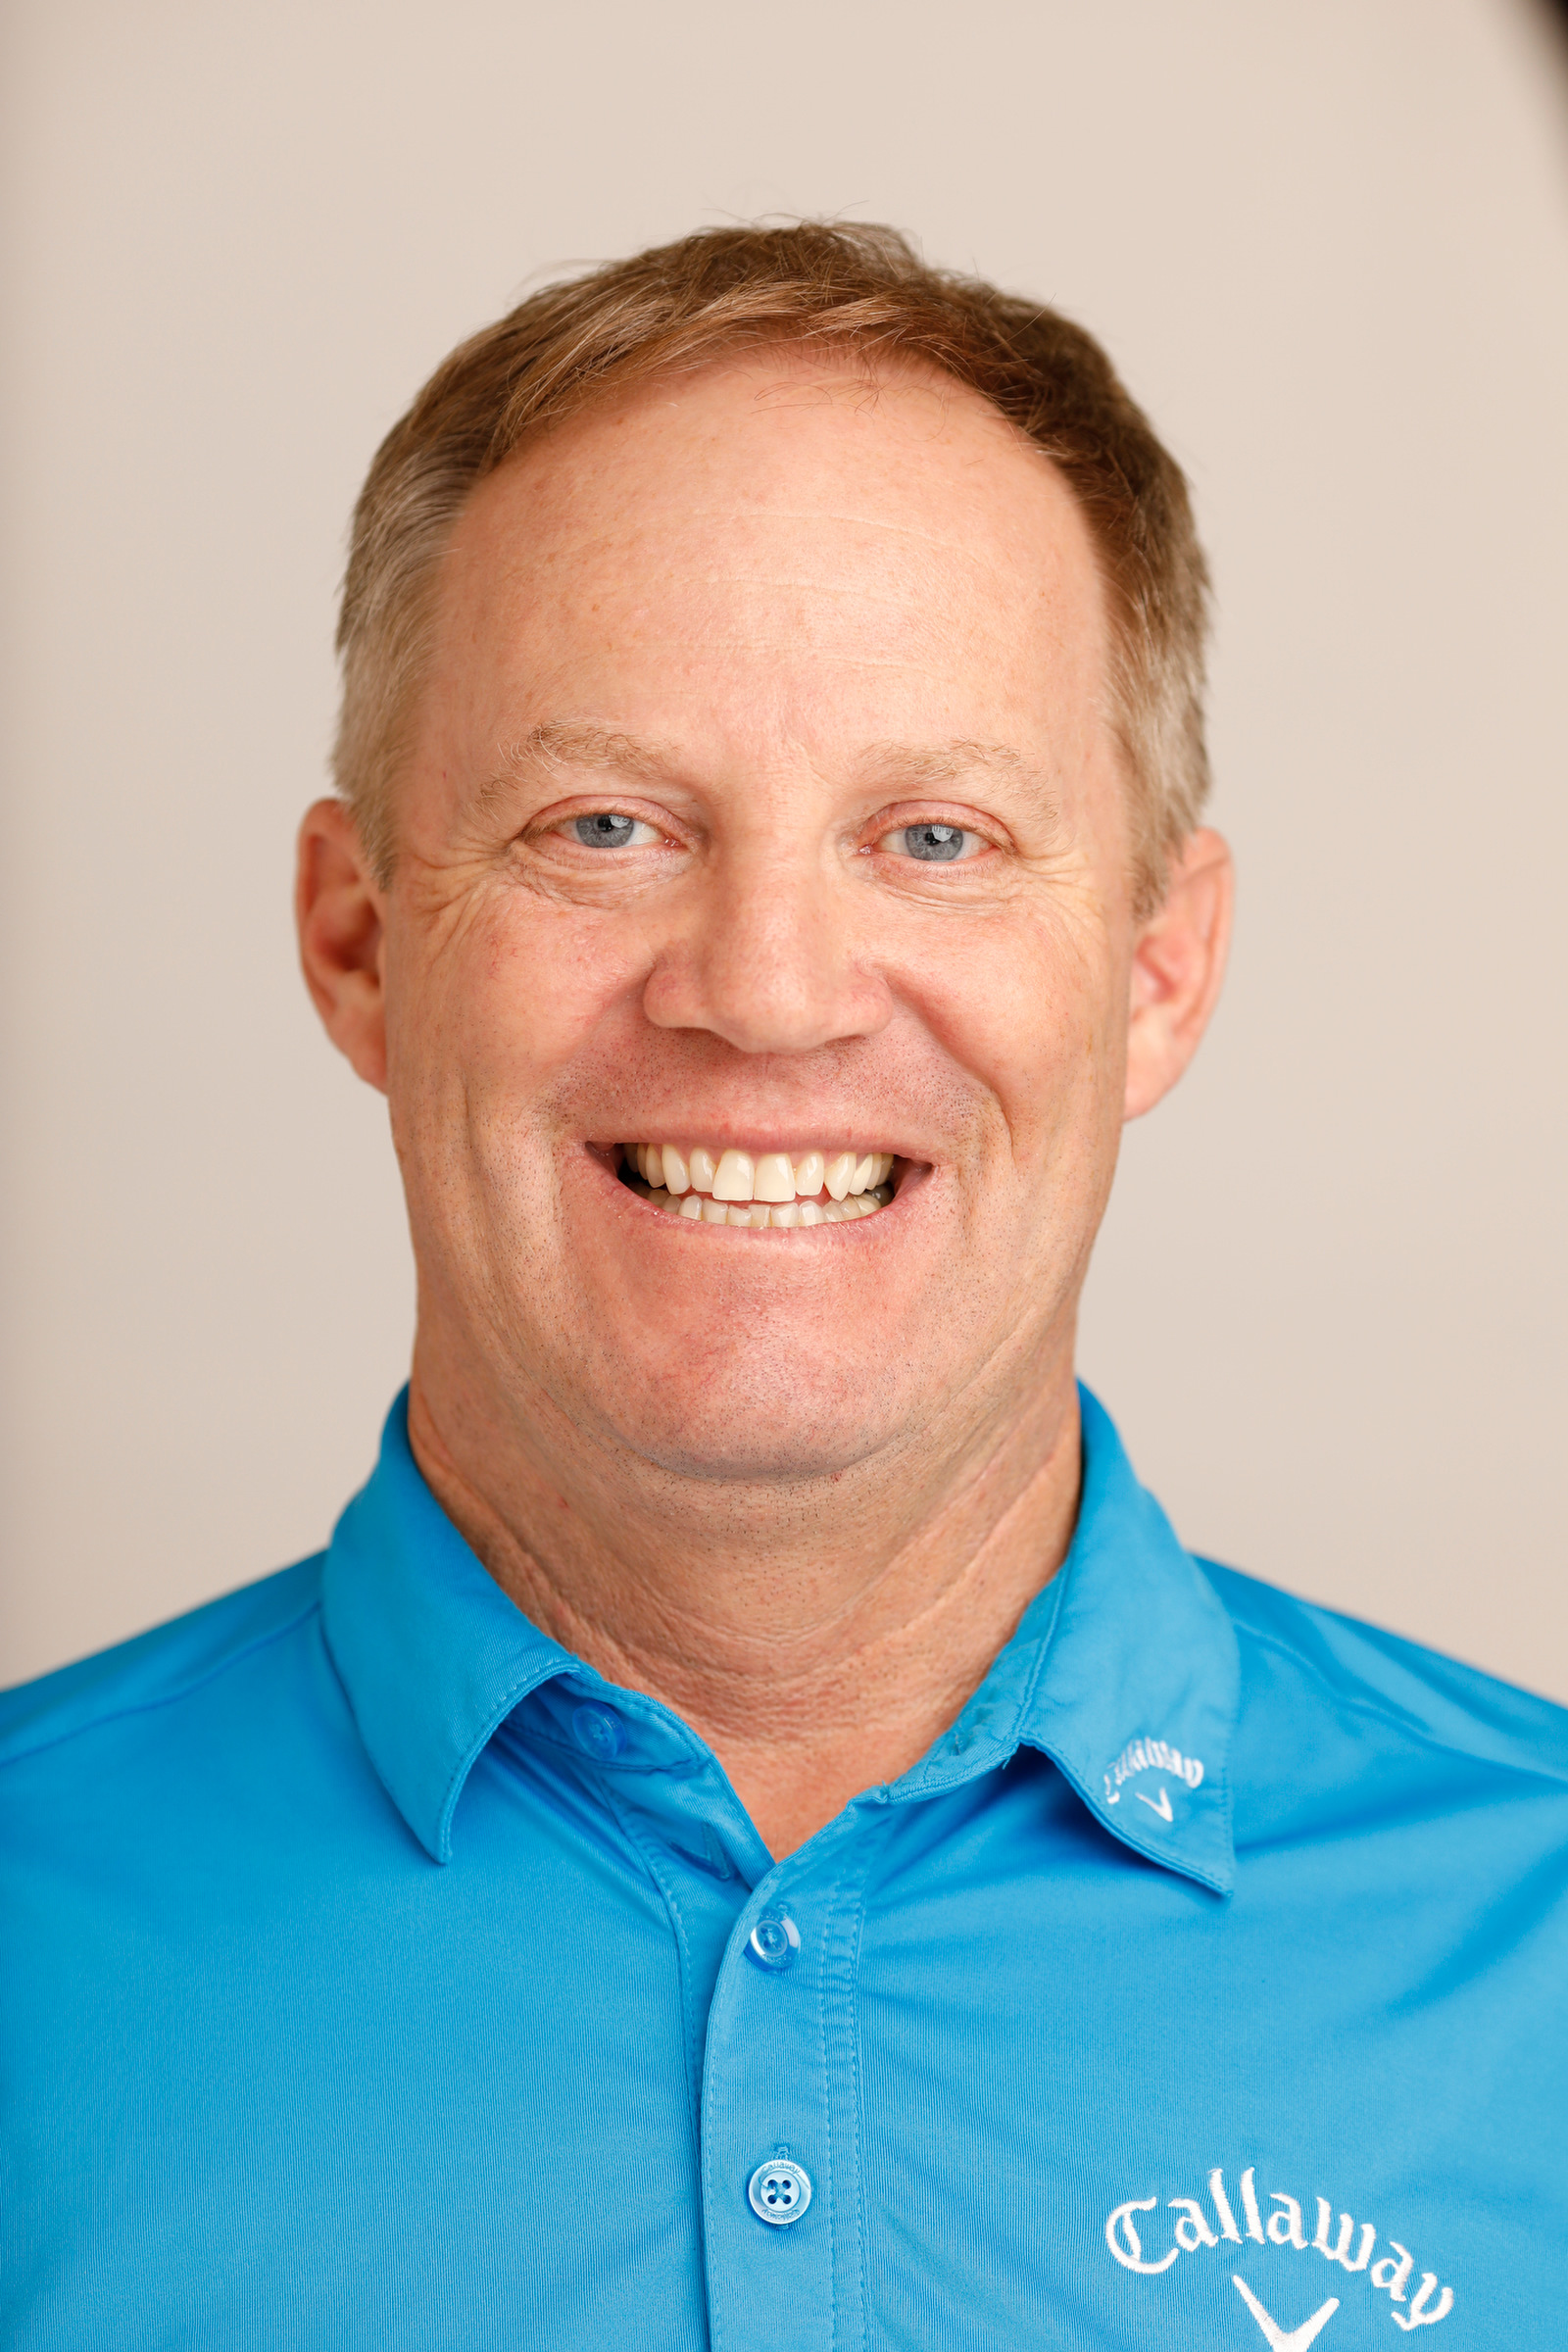 Scott Munroe